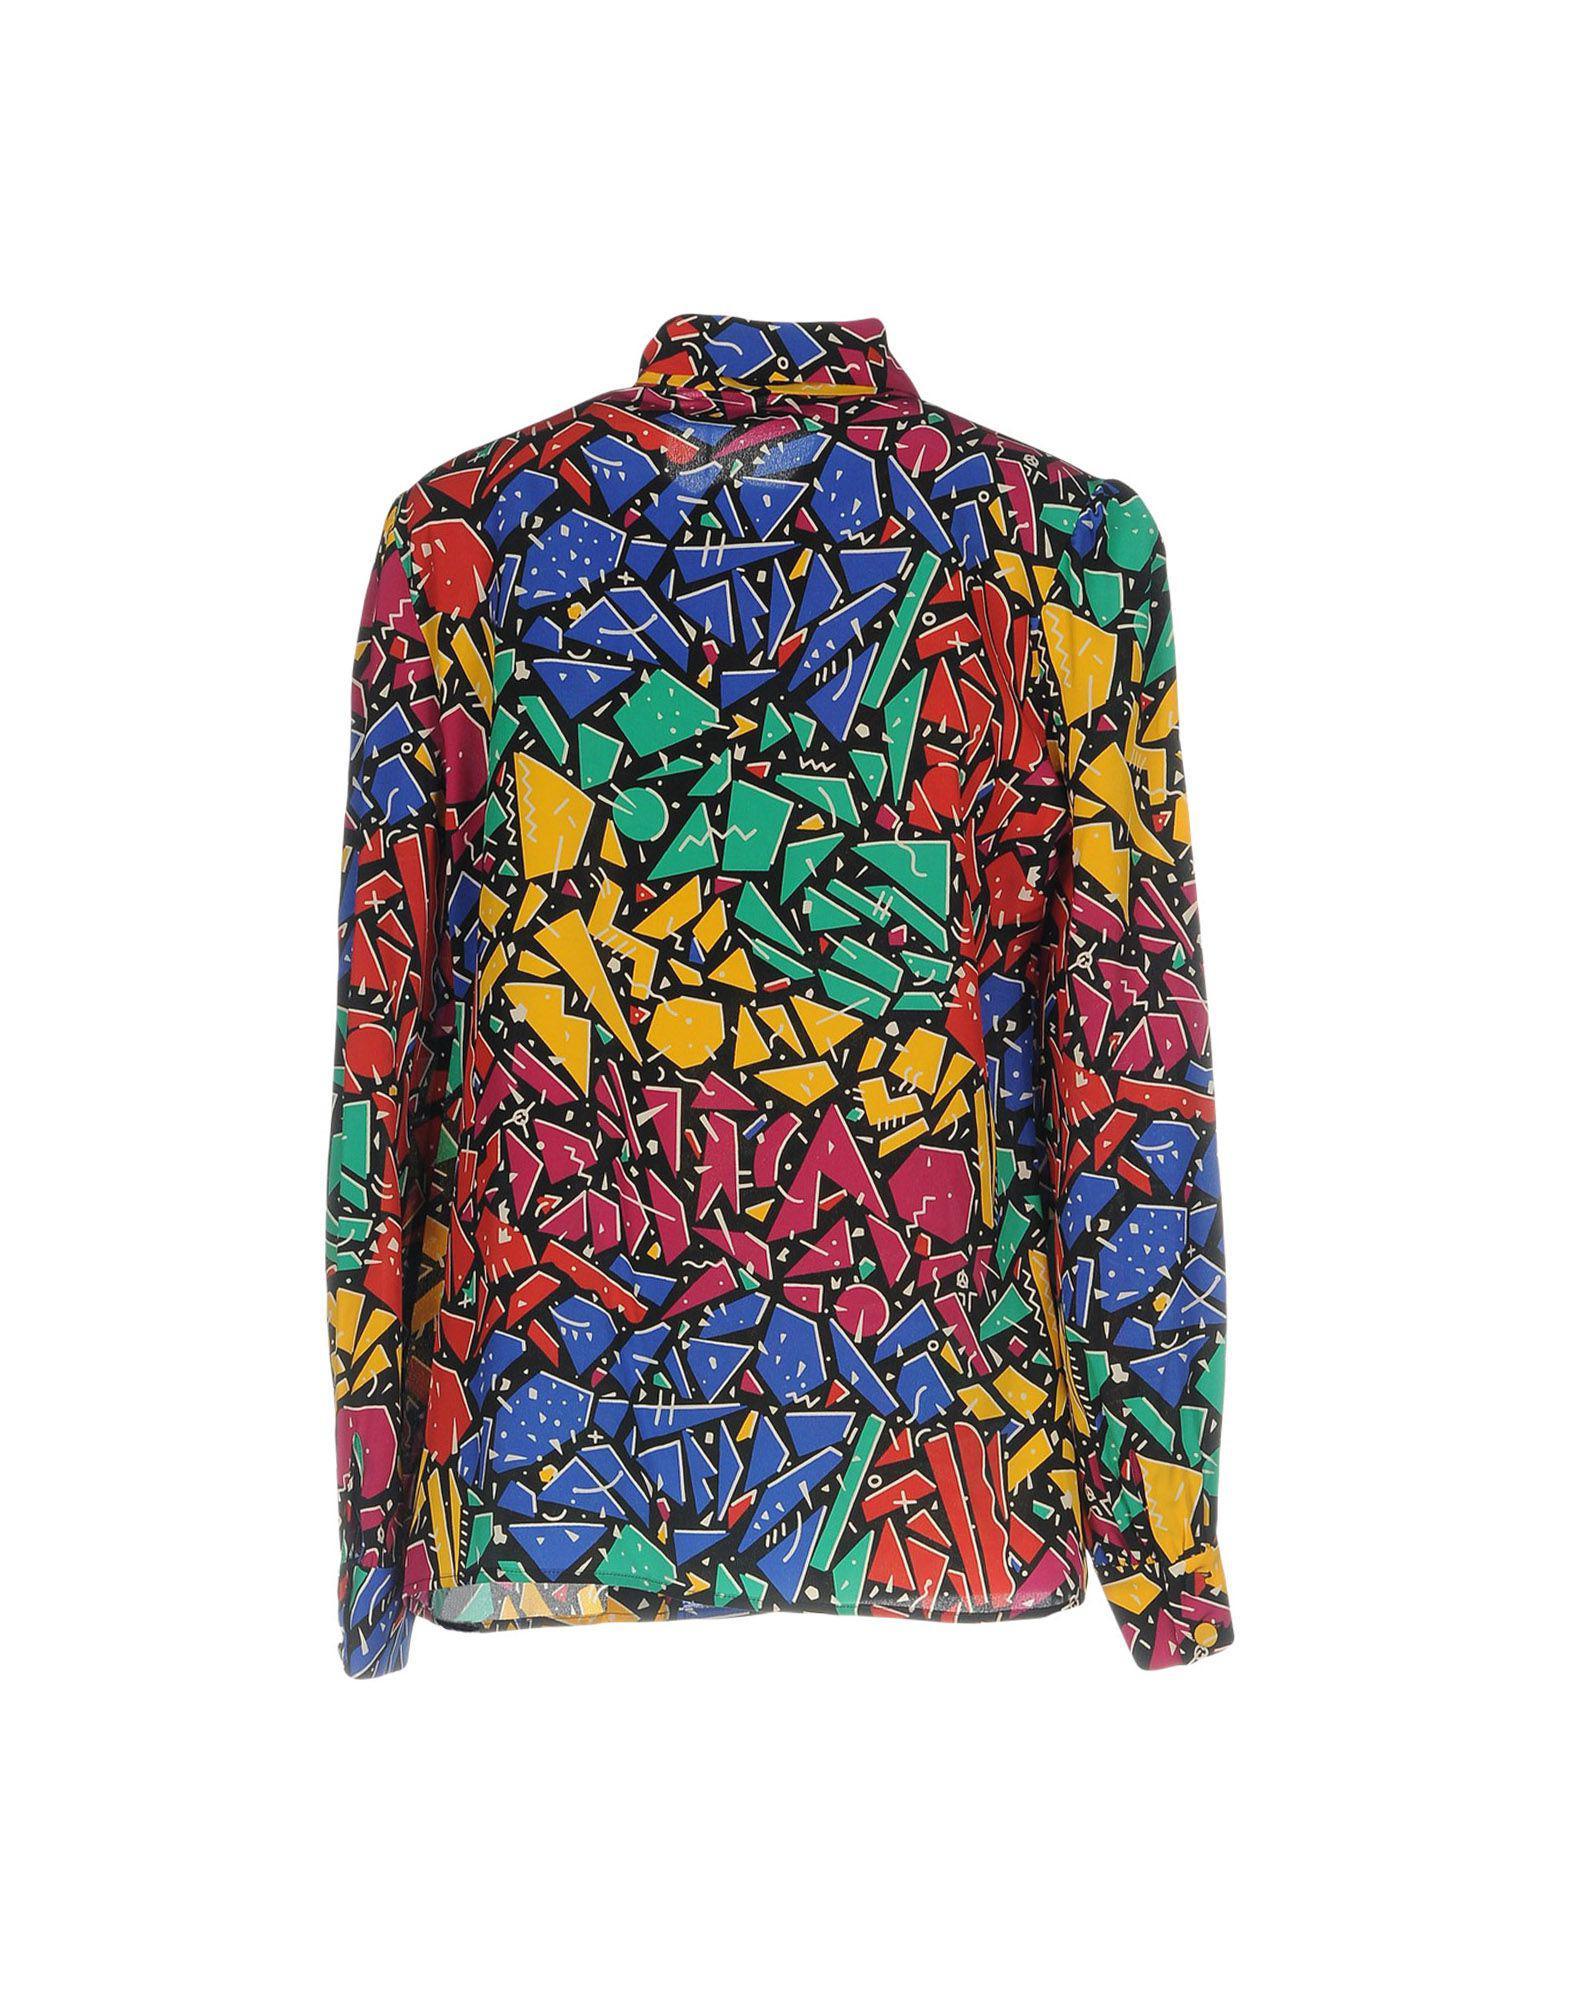 6d21b93f44a955 Lyst - Saint Laurent Shirt in Green